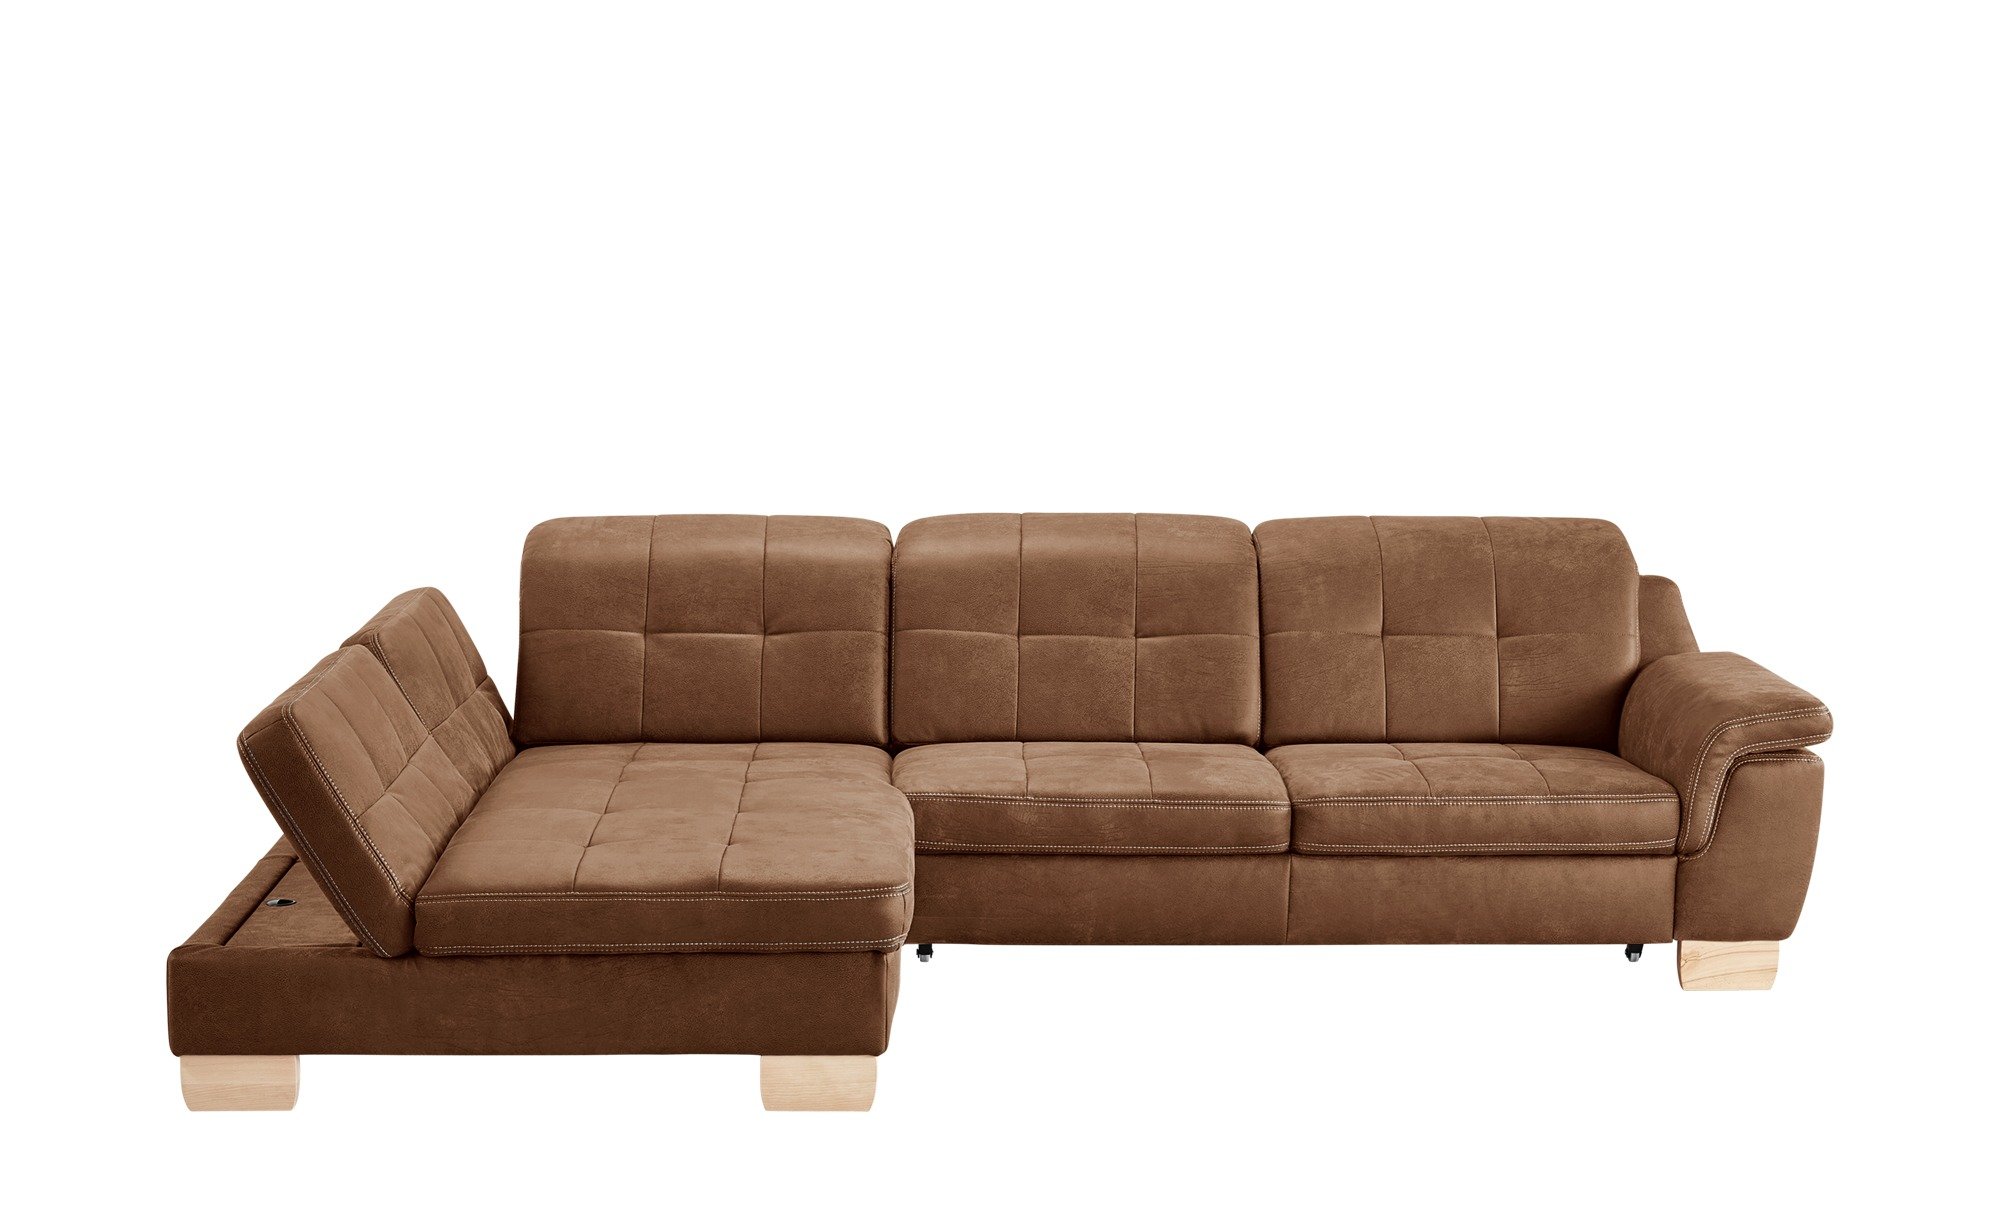 Meinsofa Ecksofa Maris Gefunden Bei Mobel Hoffner Ecksofa Braun Kunstleder Couch Sofa